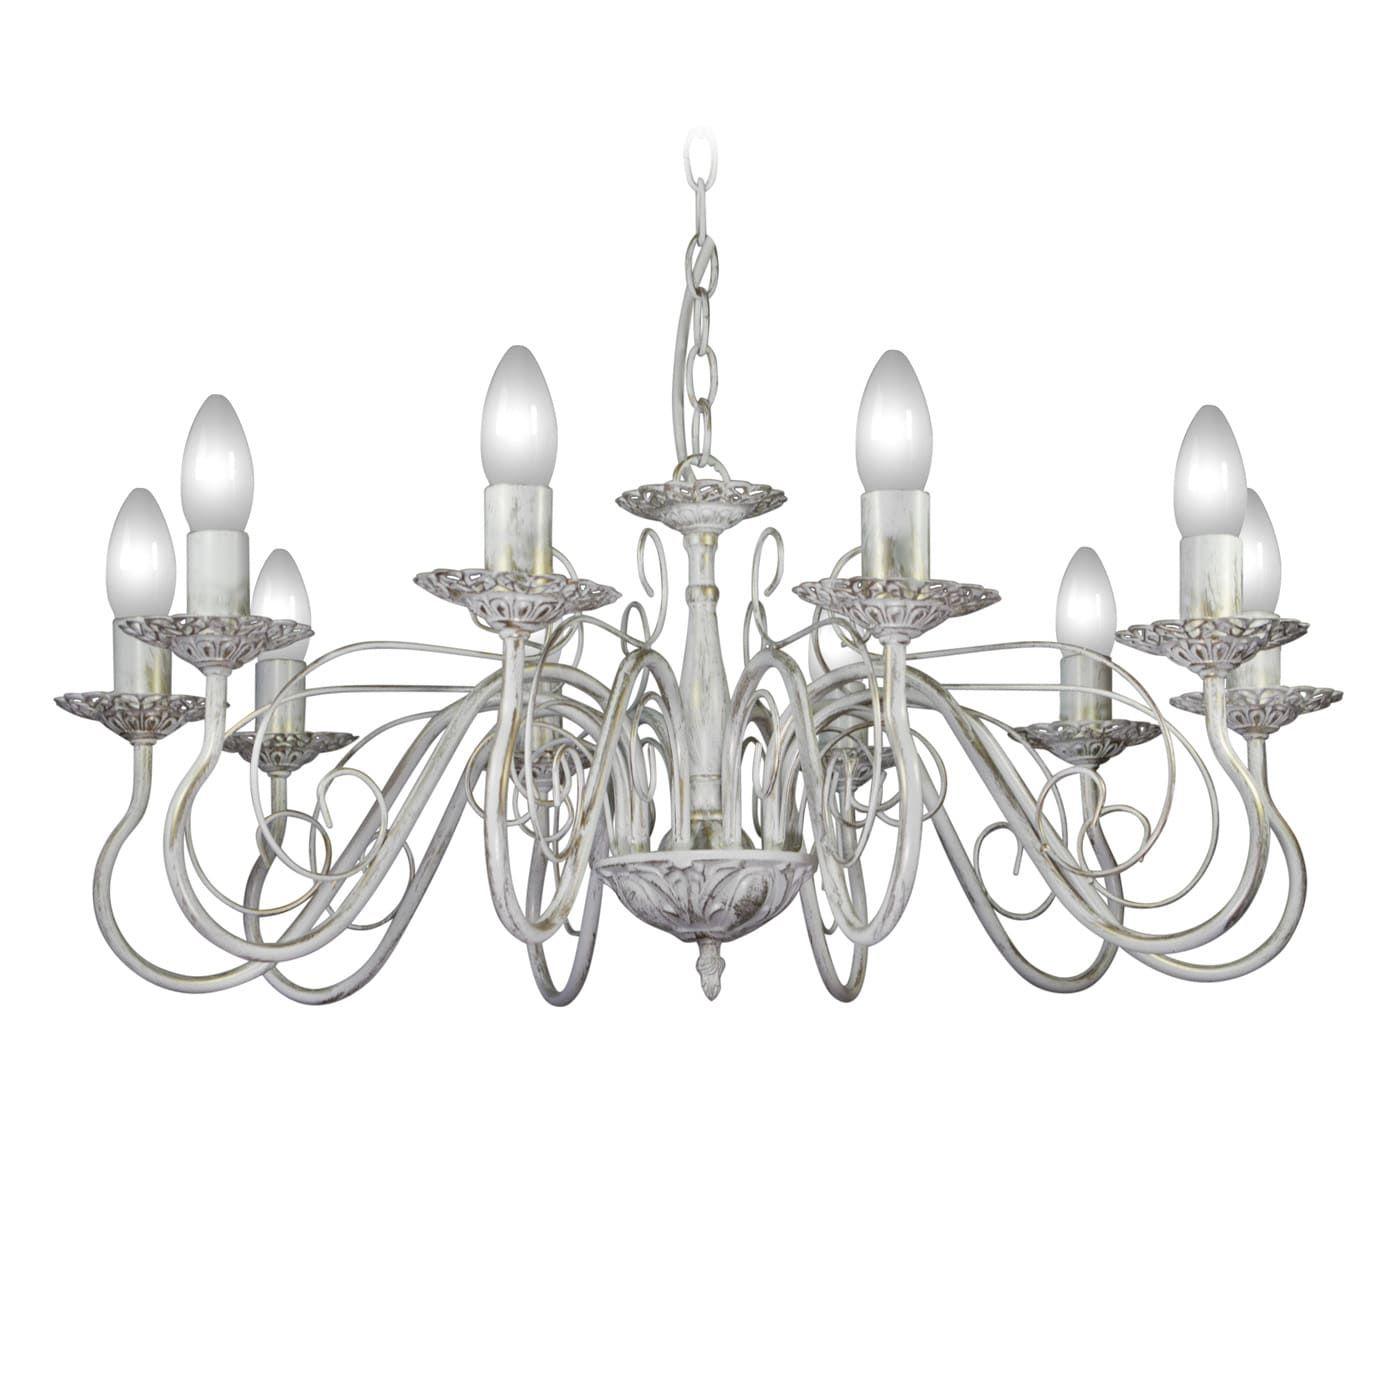 PETRASVET / Pendant chandelier S1164-12, 12xE14 max. 60W